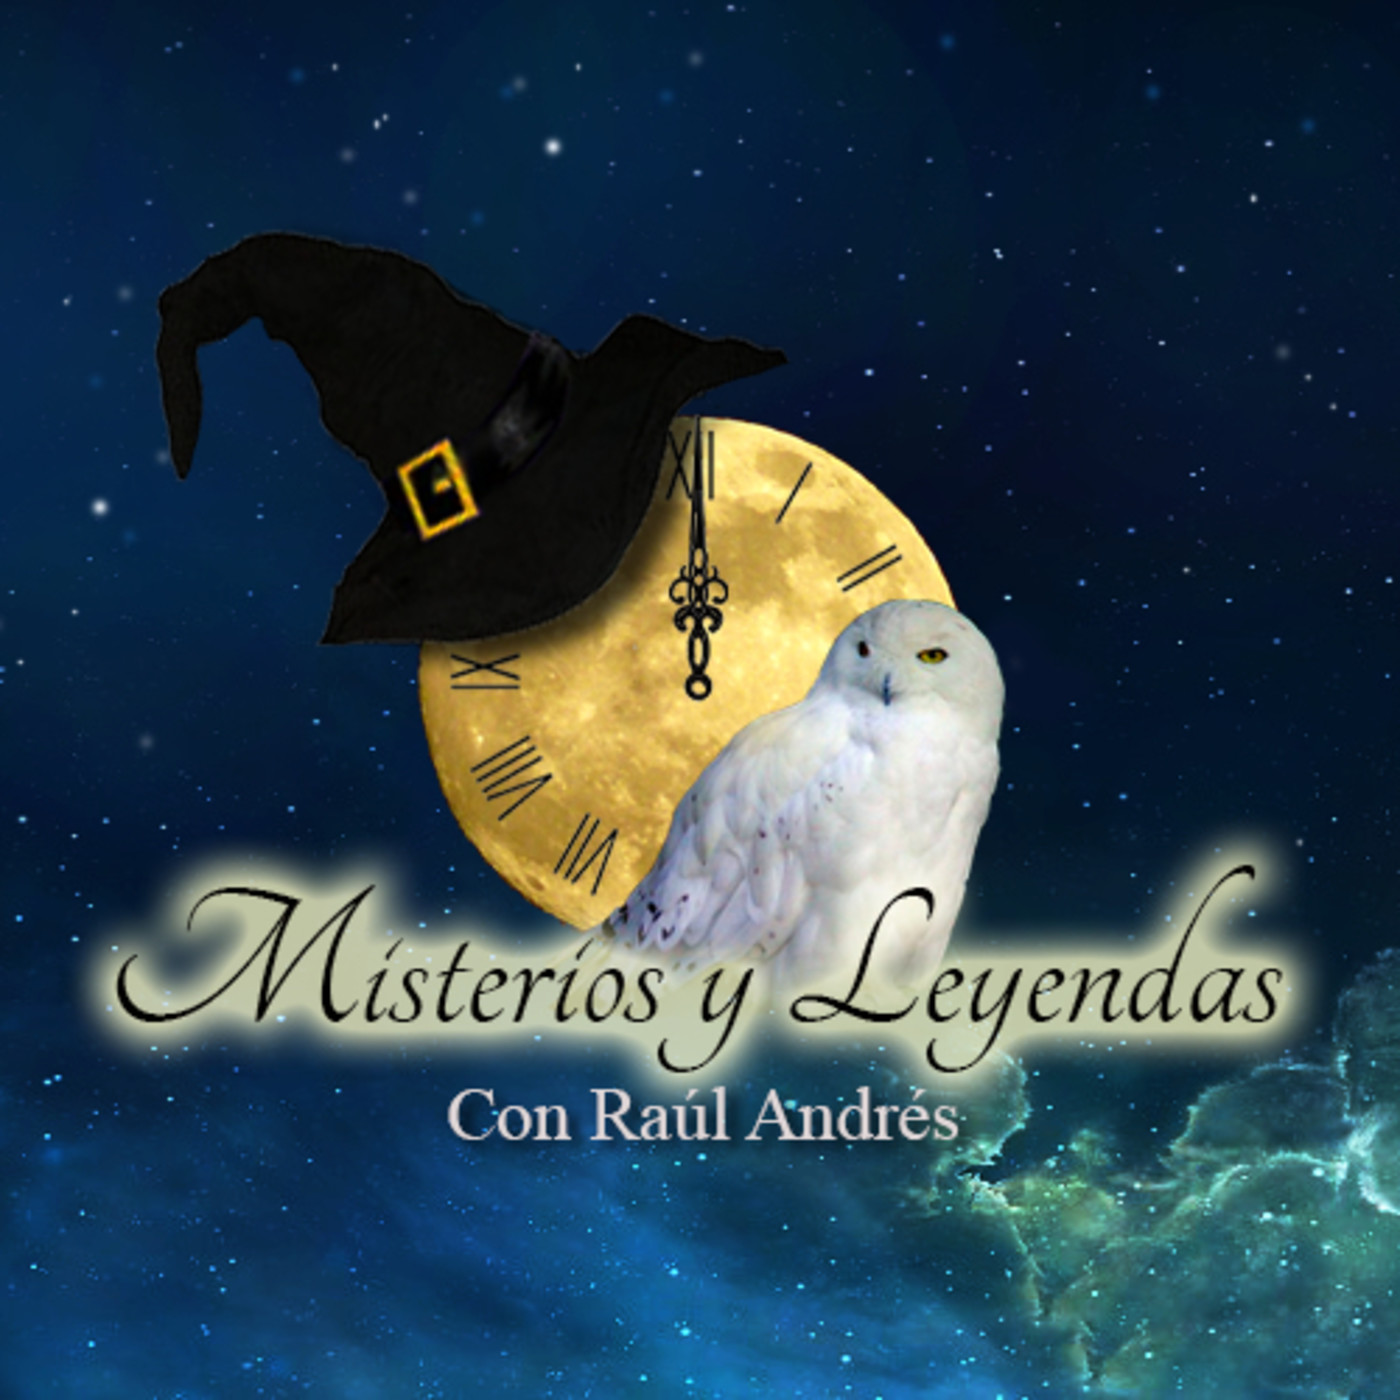 Misterios y Leyendas®